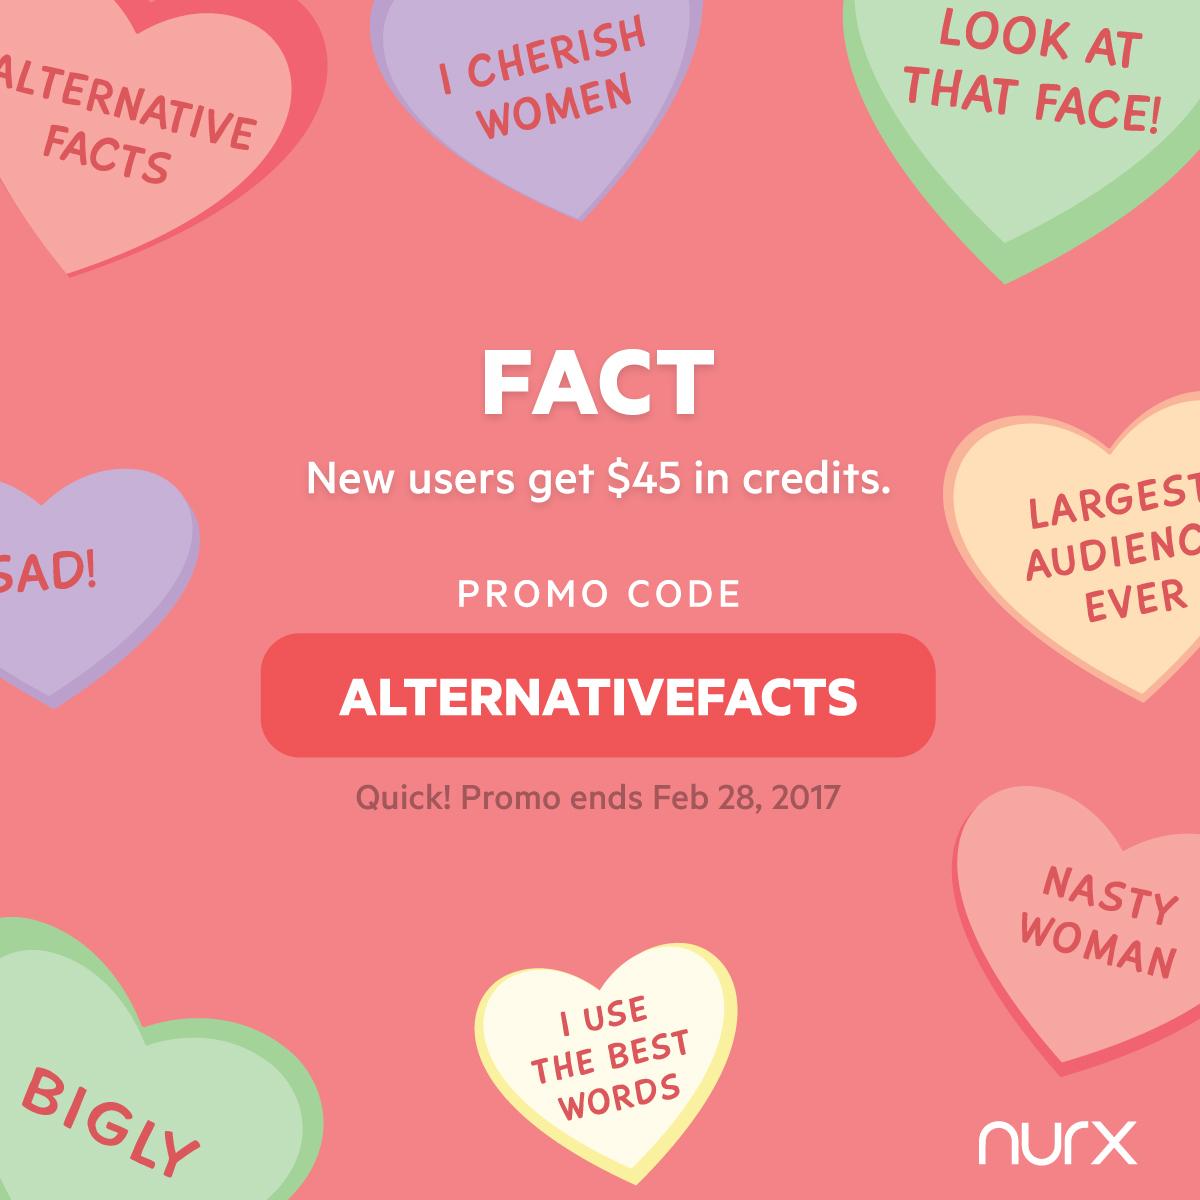 Valentines_Alternative-Facts-R2.jpg